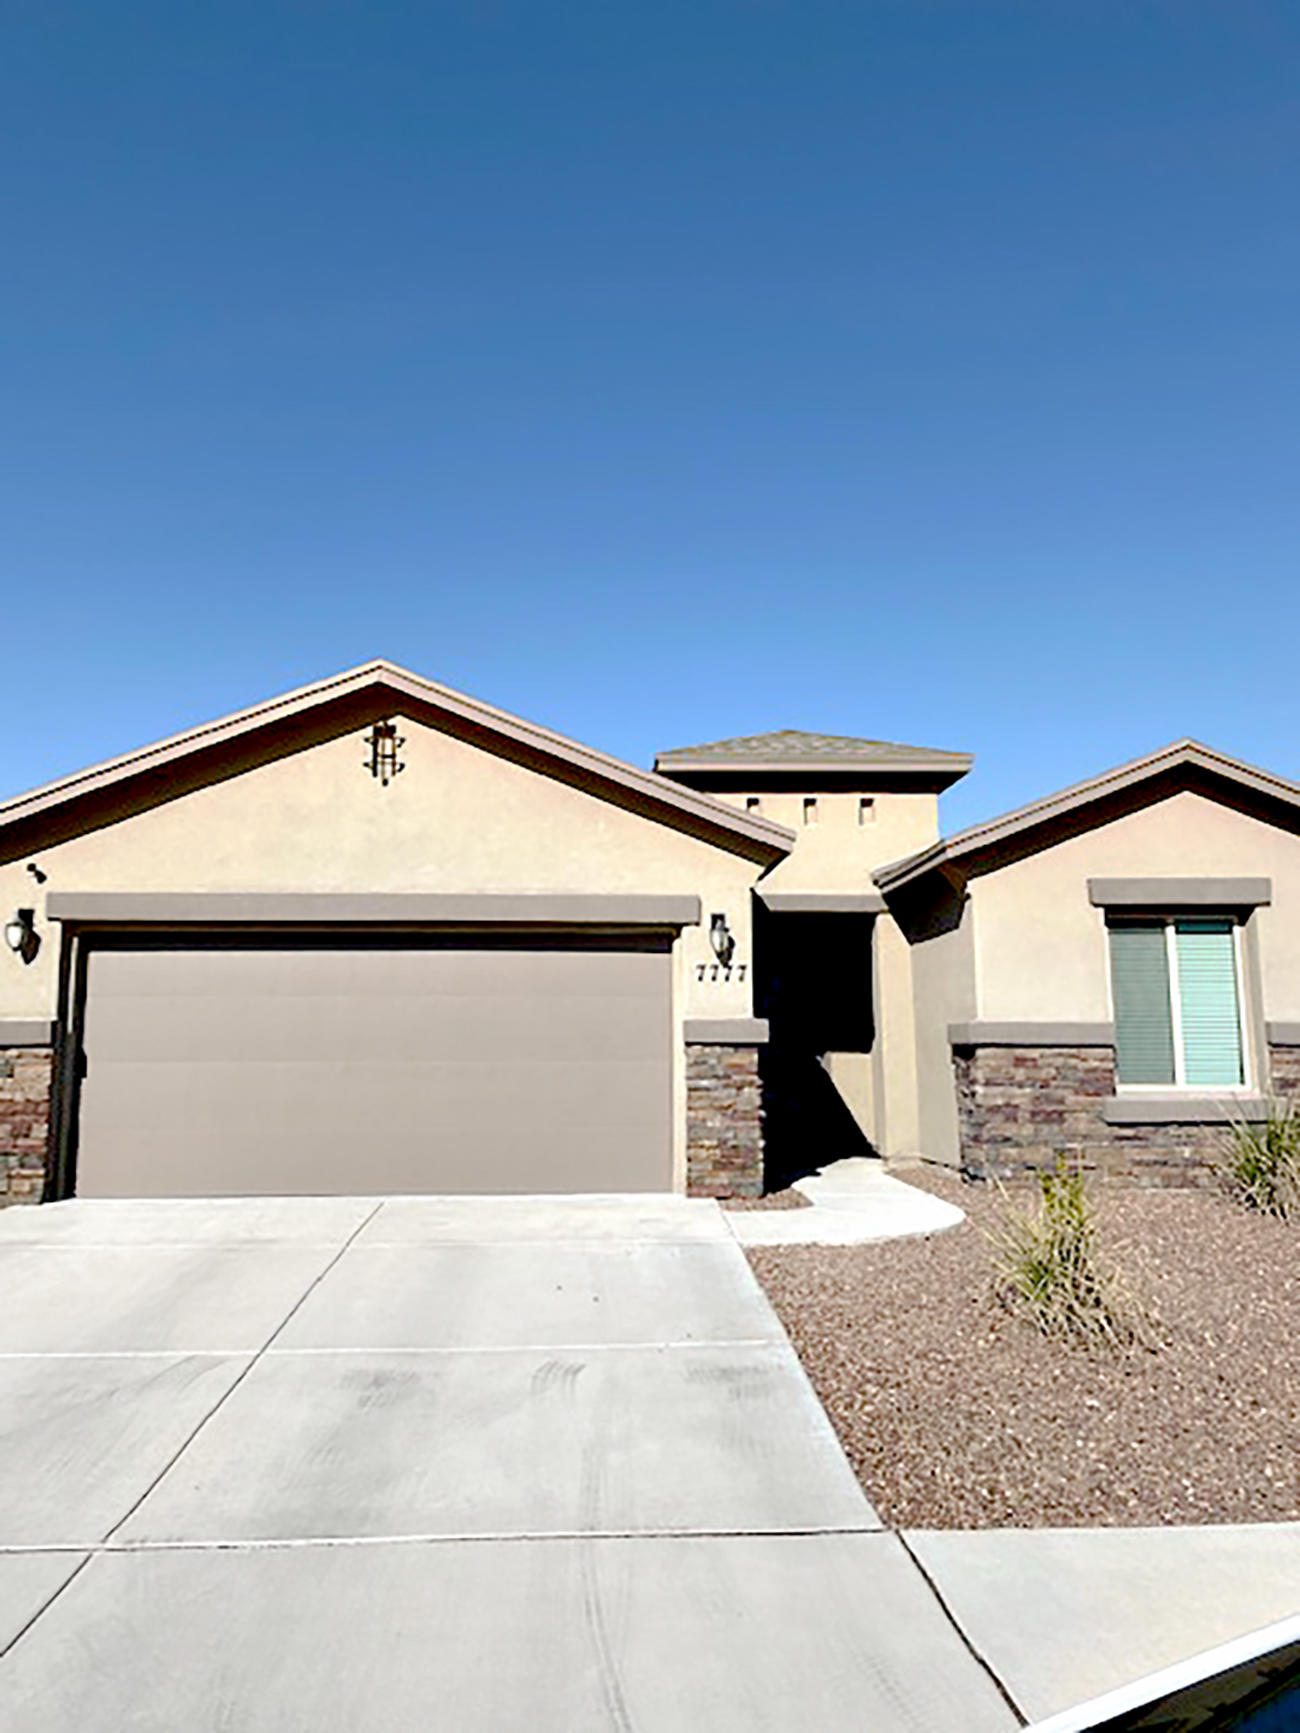 7777 Enchanted Ridge Dr Drive, El Paso, Texas 79911, 4 Bedrooms Bedrooms, ,2 BathroomsBathrooms,Residential Rental,For Rent,Enchanted Ridge Dr,837418